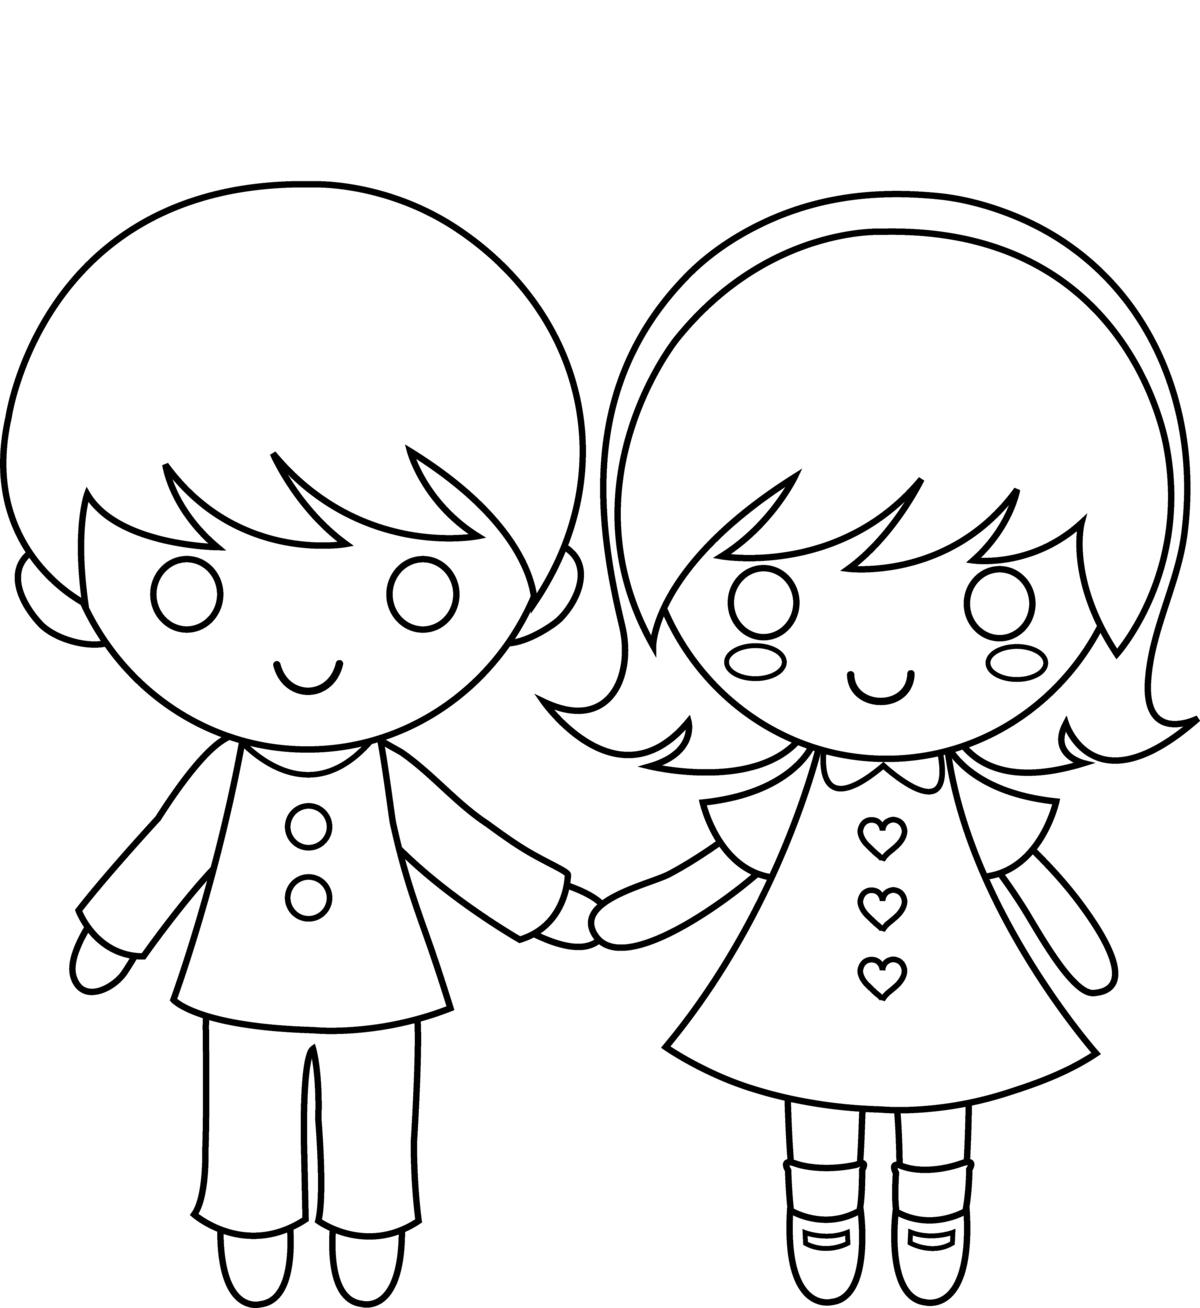 Девочка и мальчик картинка карандашом